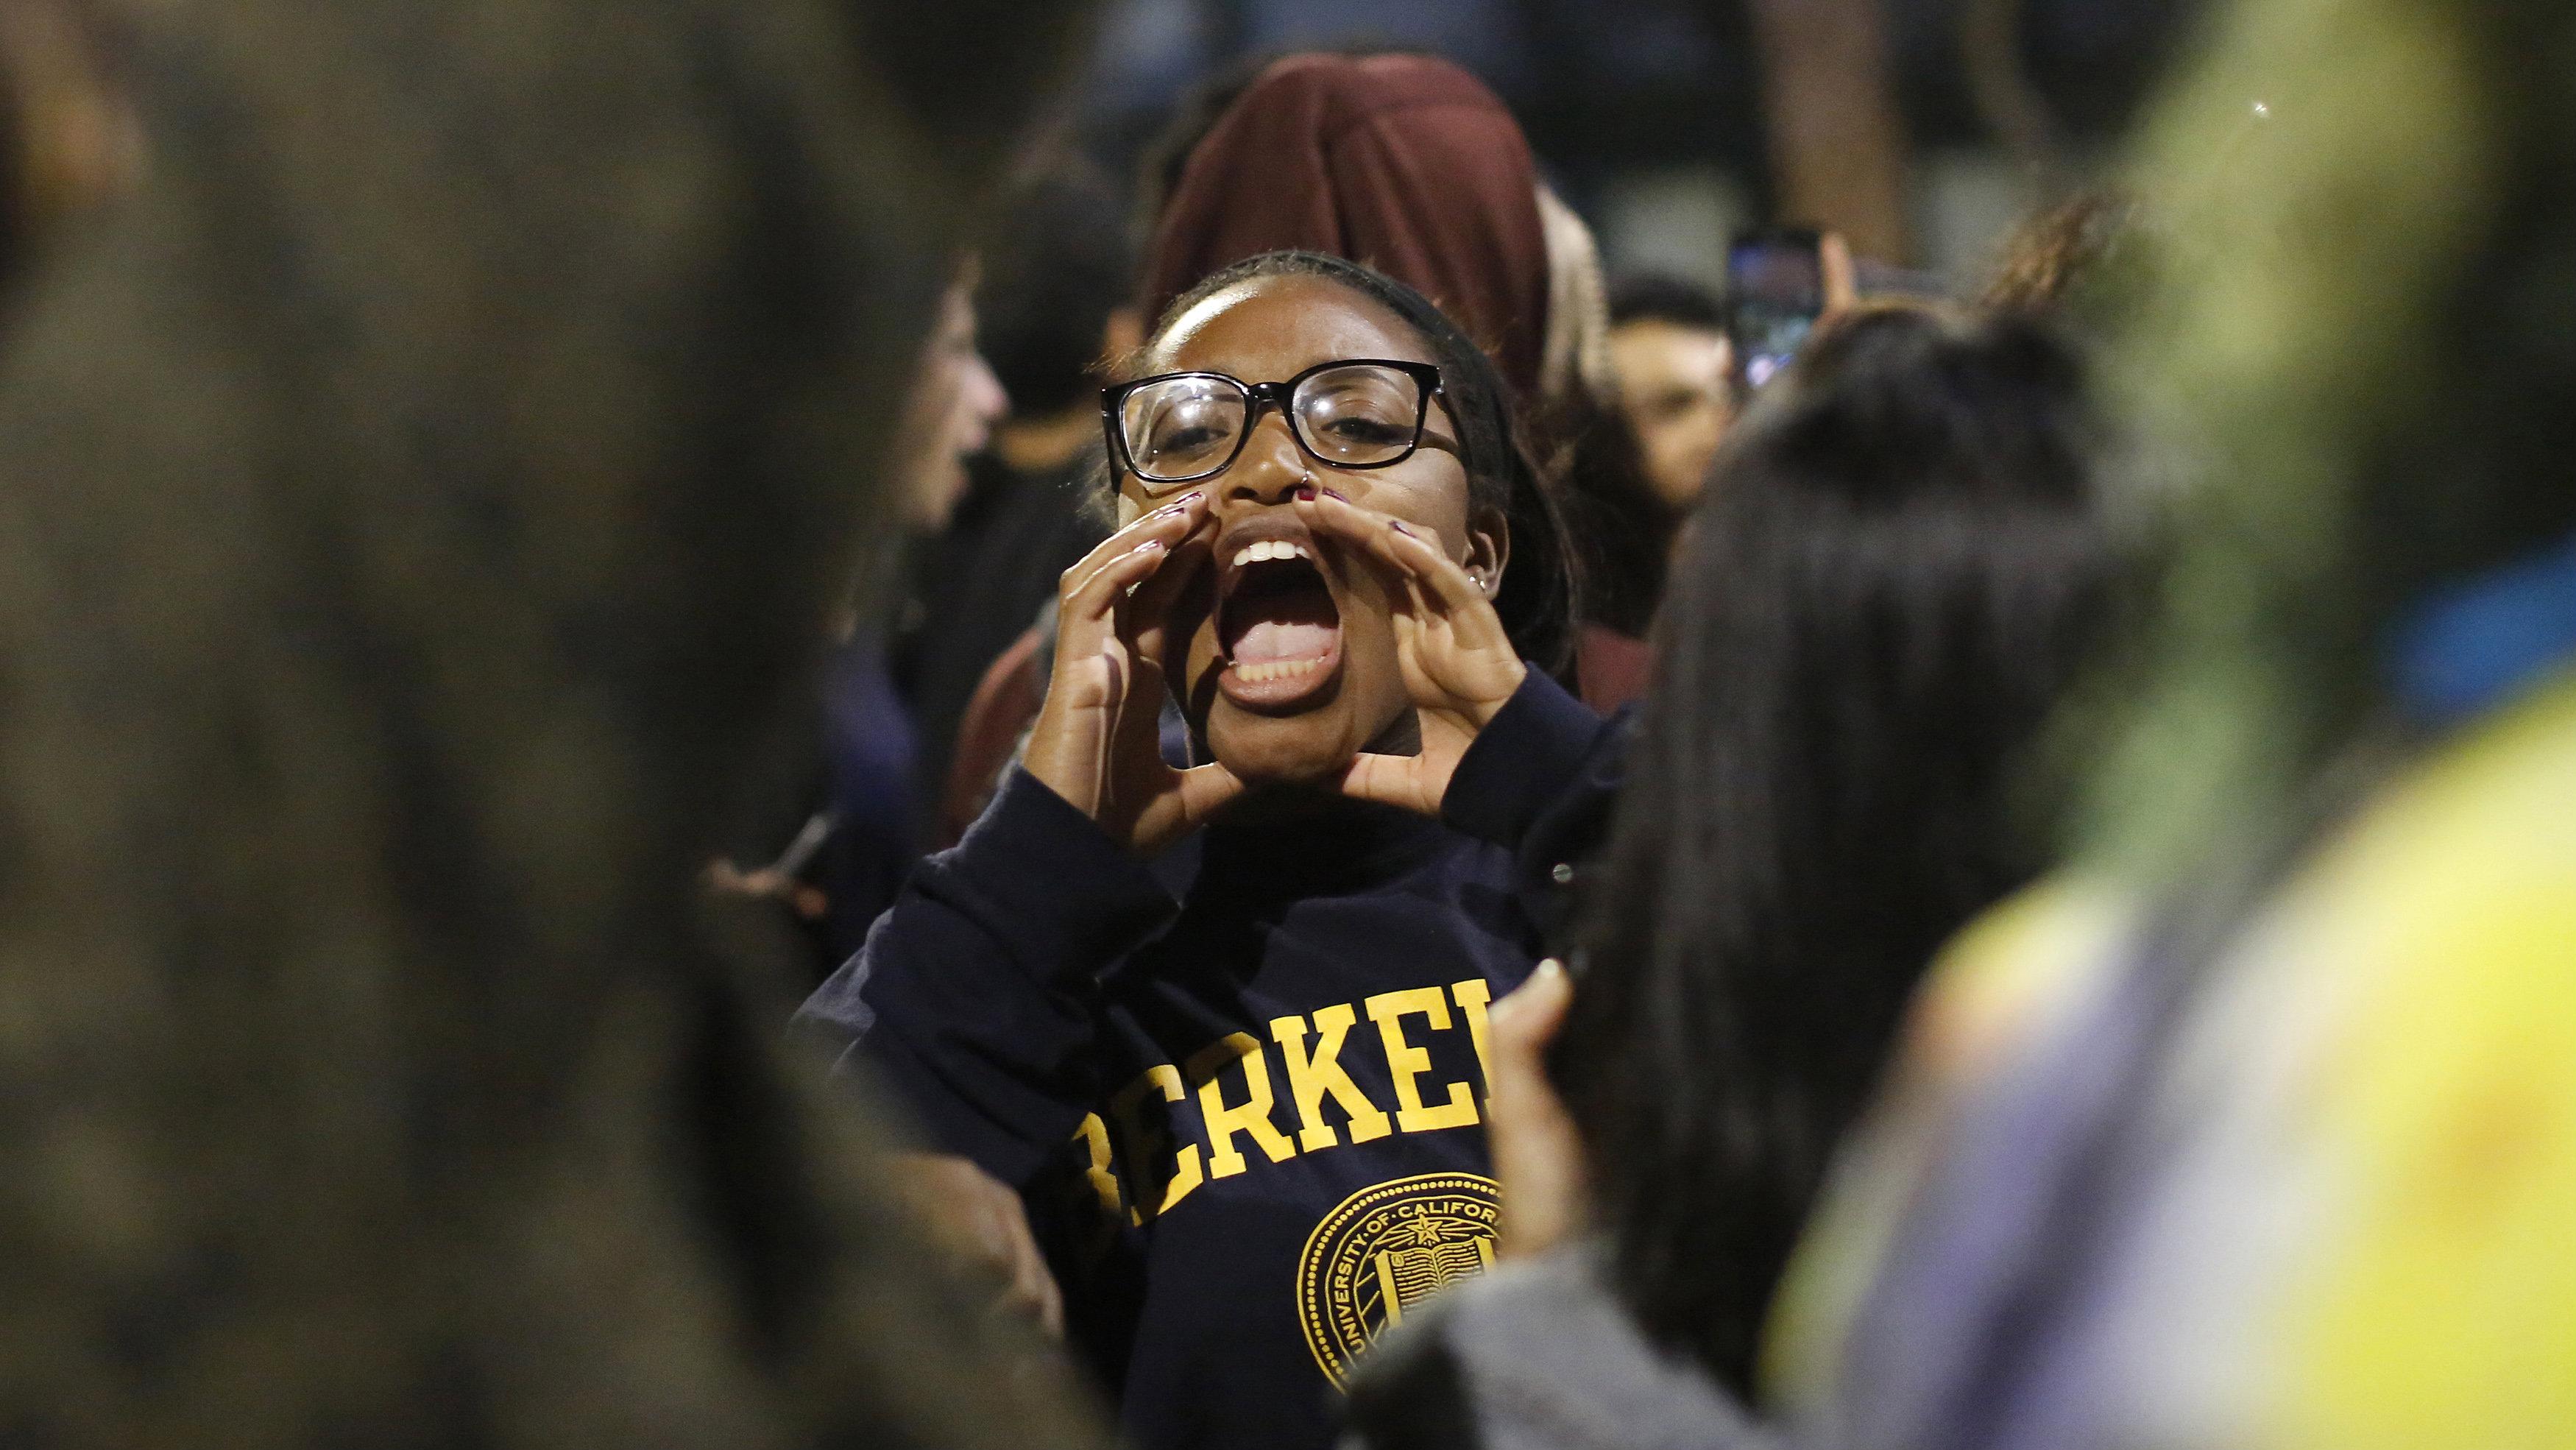 df78a86d3419 An open letter of love to black students: #BlackLivesMatter — Quartz